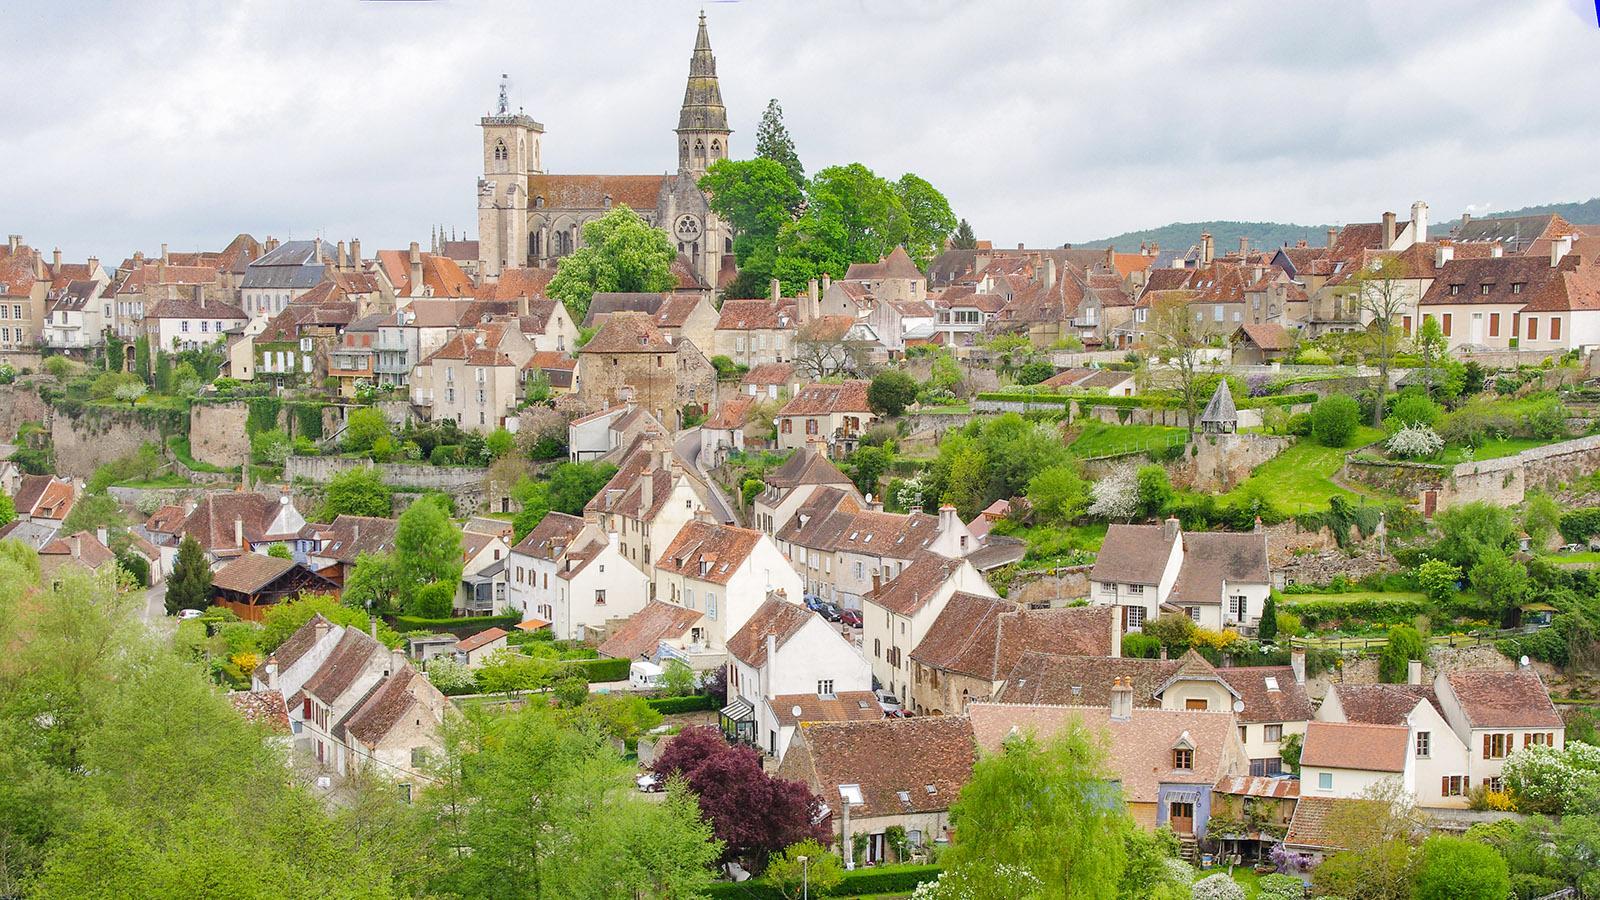 Semur-en-Auxois. Foto: Werner Münzel